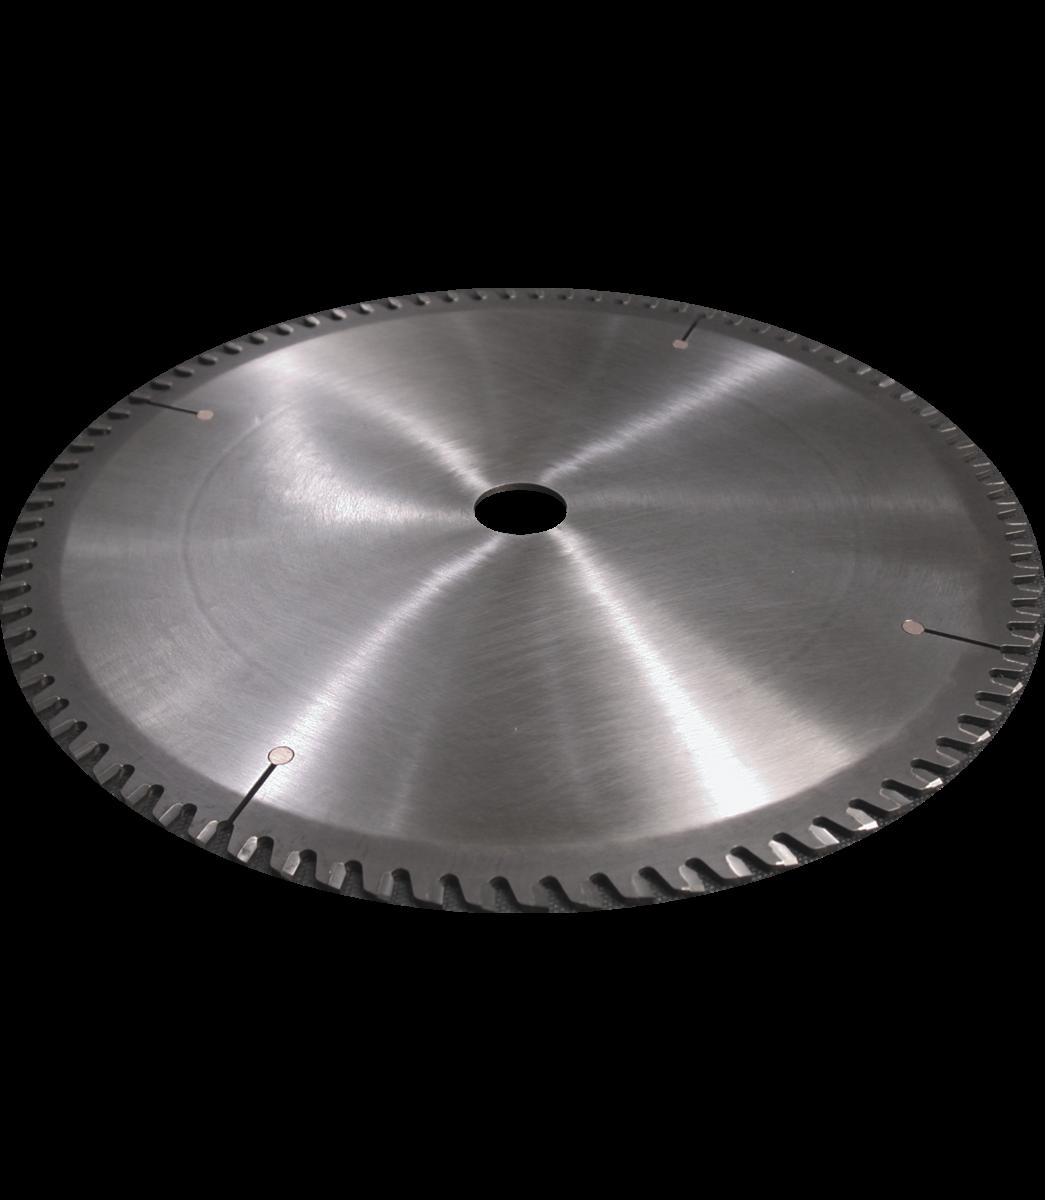 Ferrous Circular Saw Blade 350mm x 32mm x 2.5mm x 180T For J-FK350-2/4K